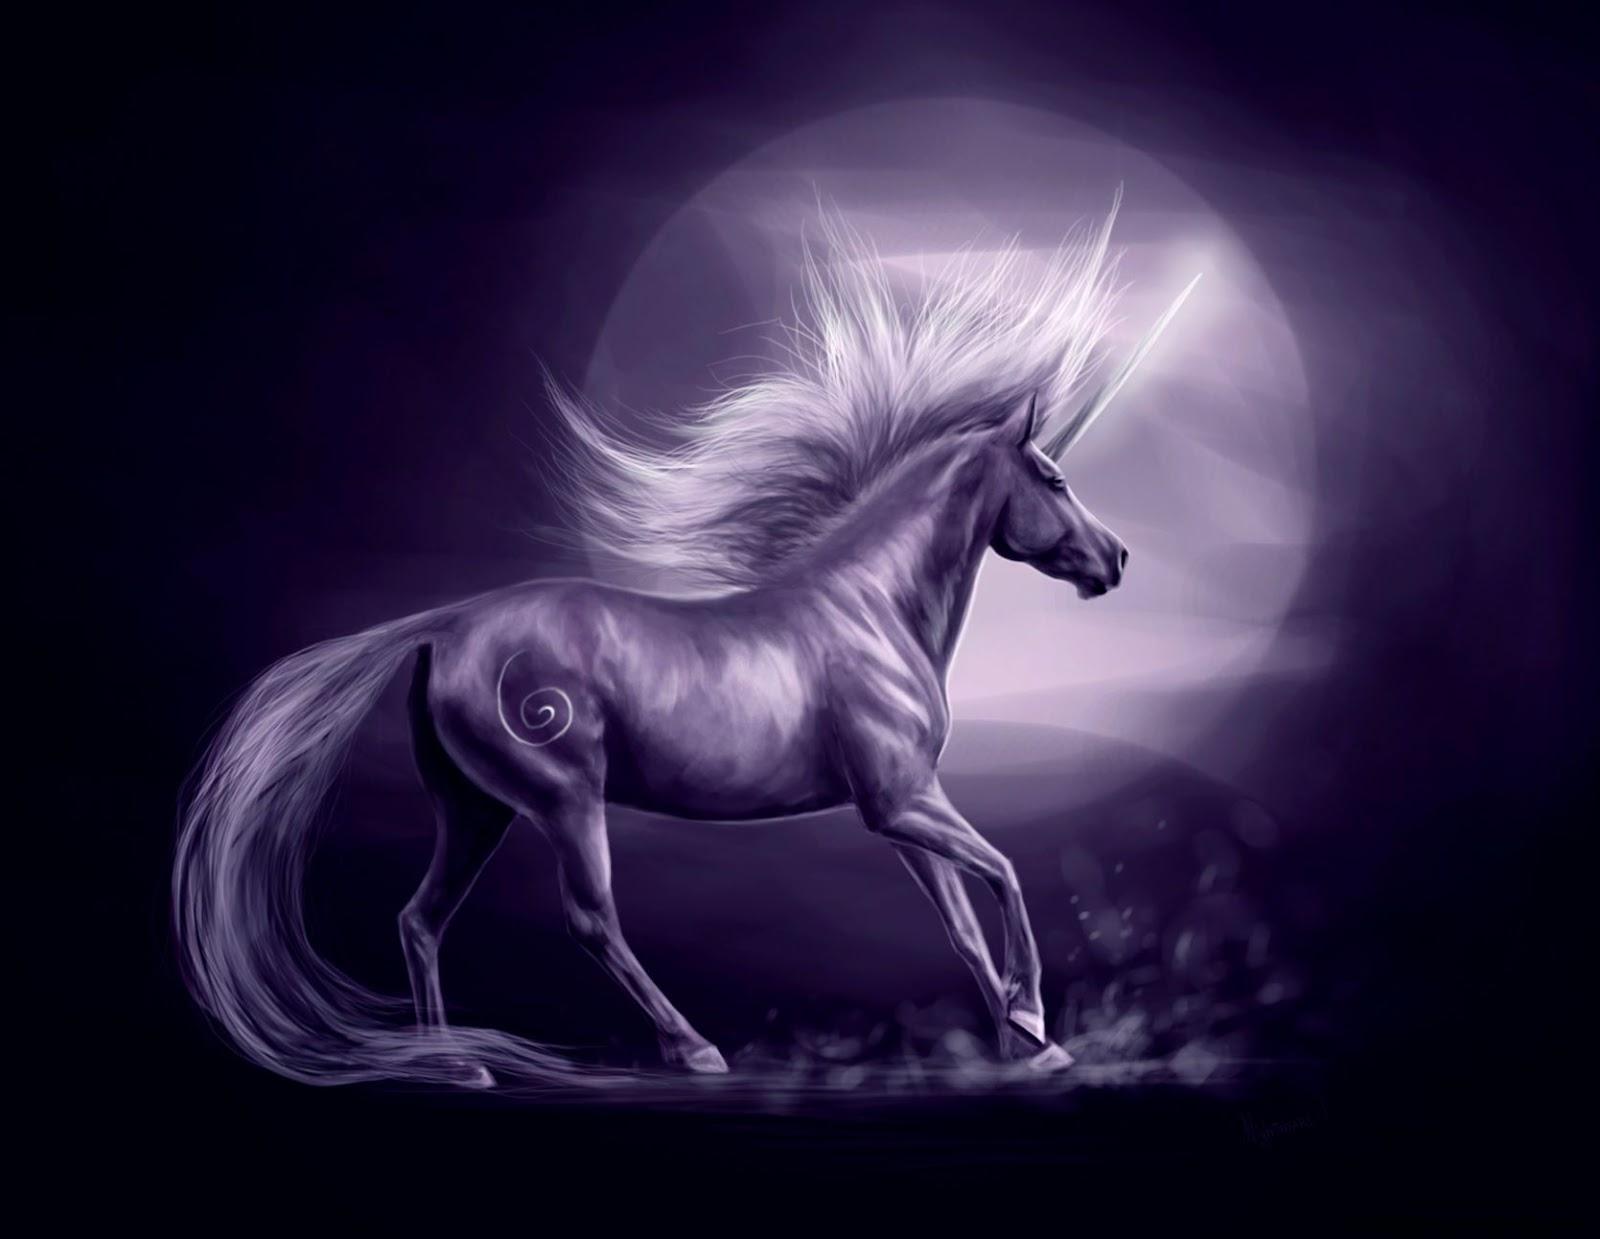 Fantasy Unicorn Background Wallpaper Full Hd Wallpapers